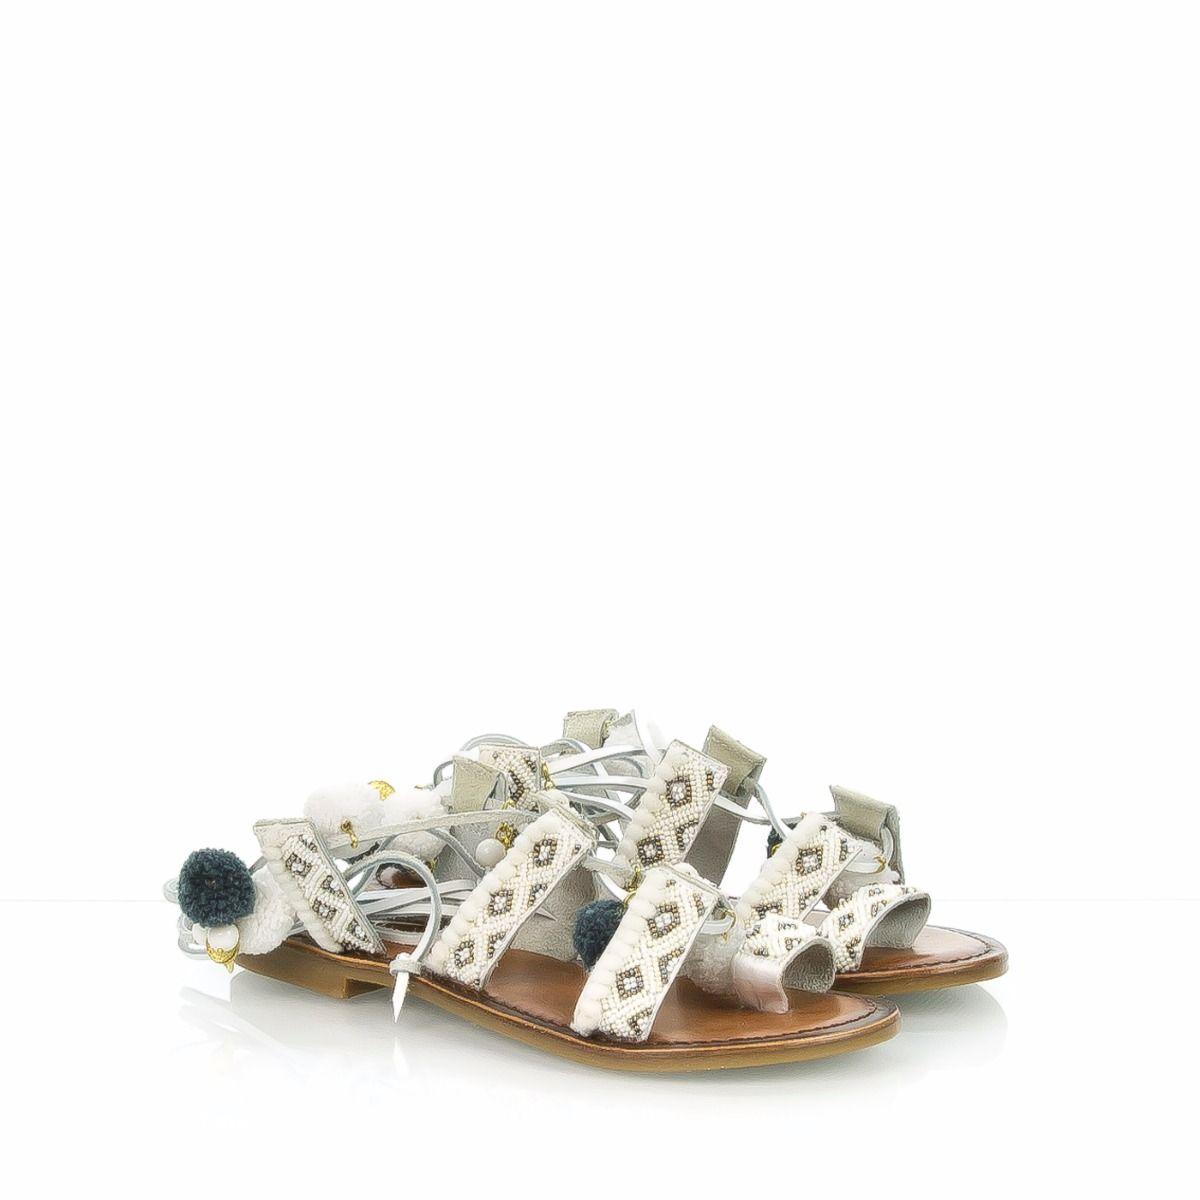 Bianco Inuovo 7166 Sandalo Ponpon Basso W9DHIE2